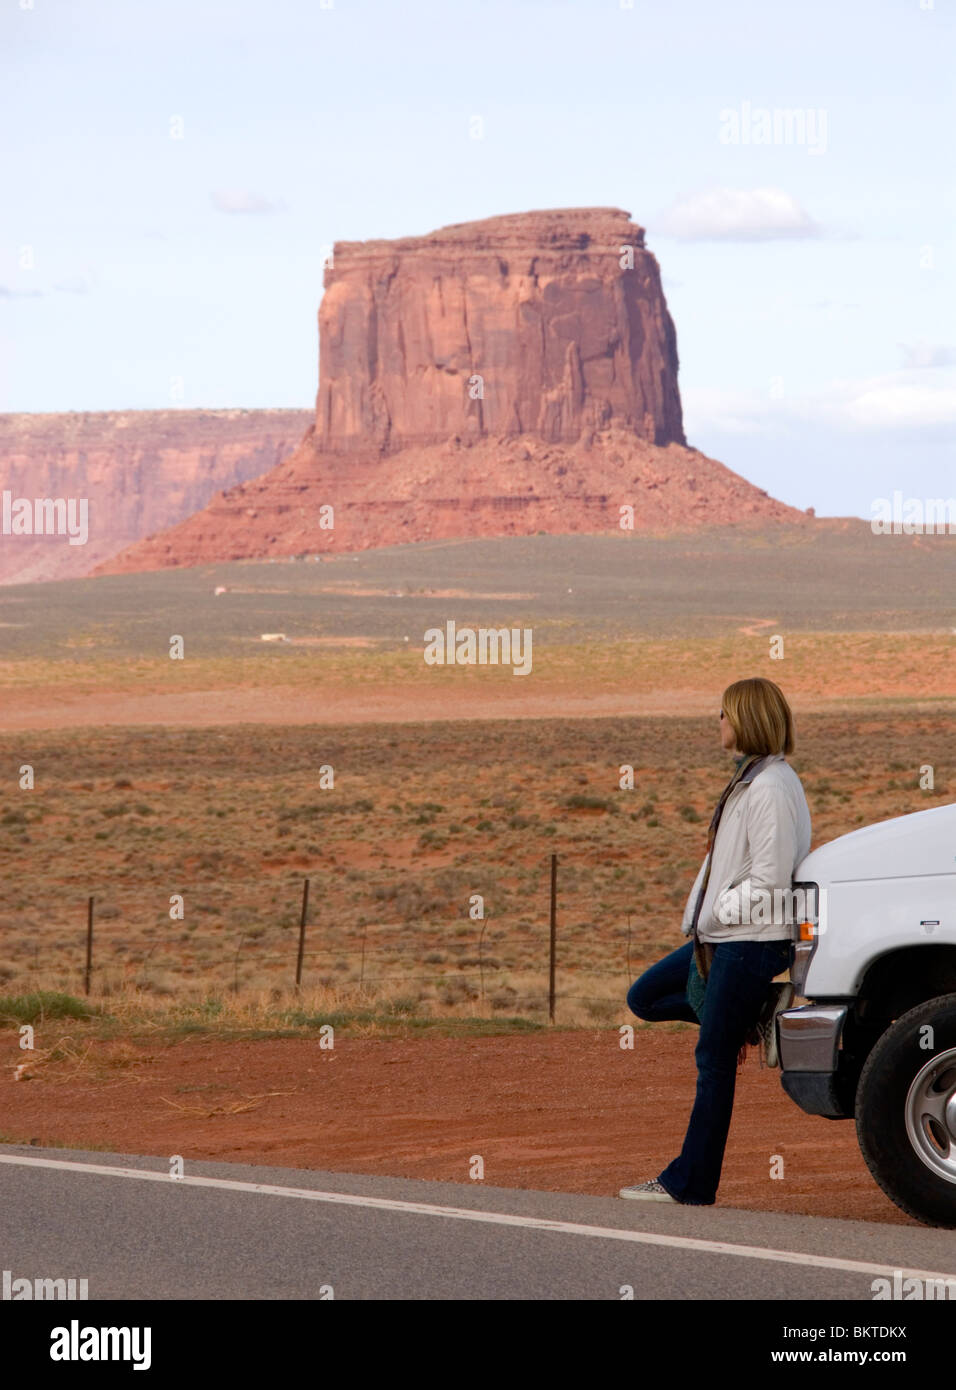 Female tourist leaning on Cruise America RV campervan Monument Valley Highway 163 Arizona Utah border USA Kim Paumier - Stock Image